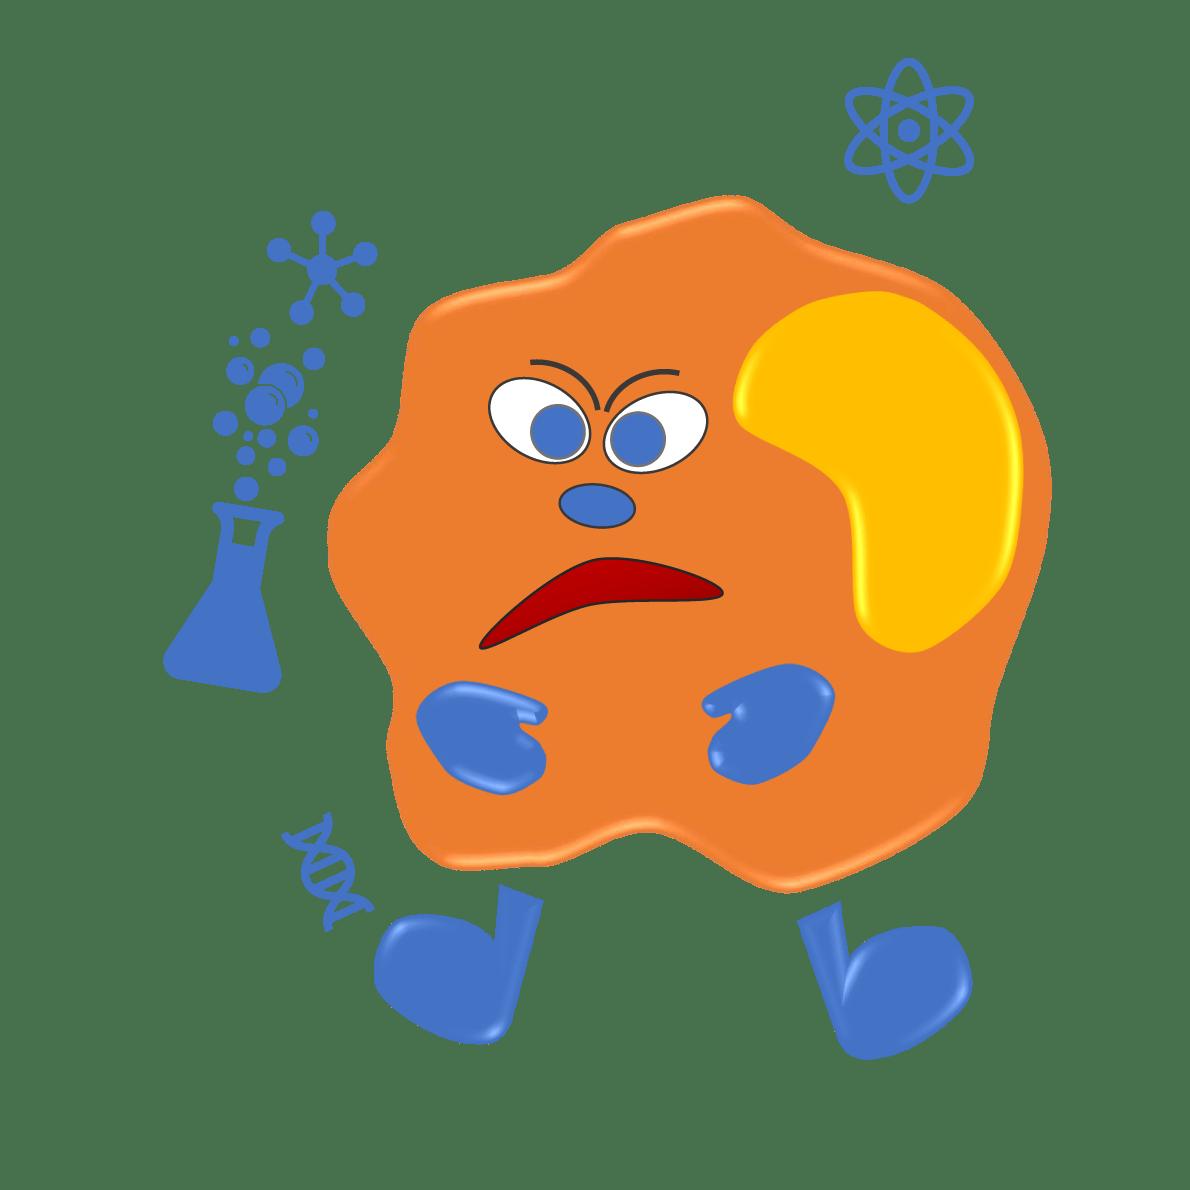 immunologie allergologie Allergologie paiano - CIAO